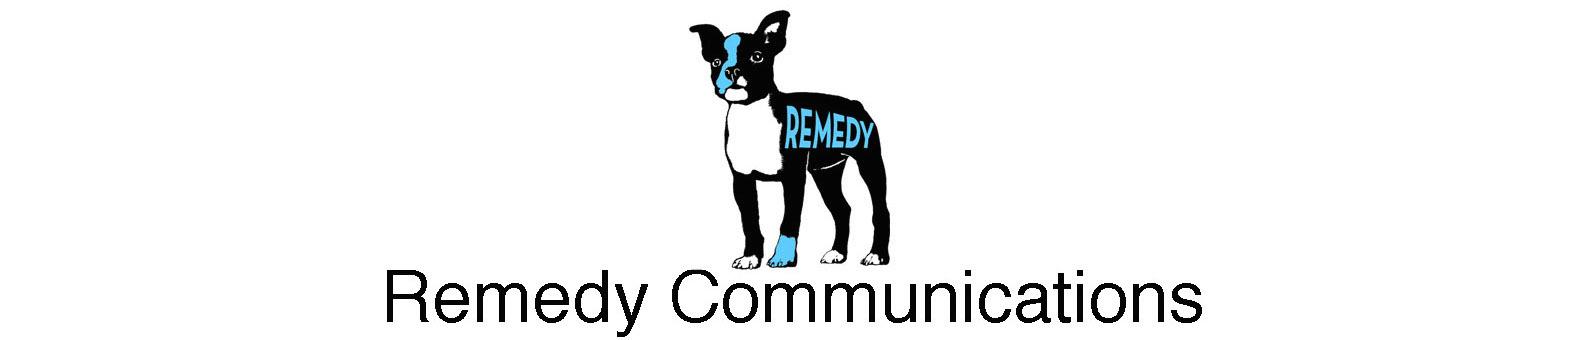 Remedy-Header-Draft_Helvetica_Blue-puppy.jpg